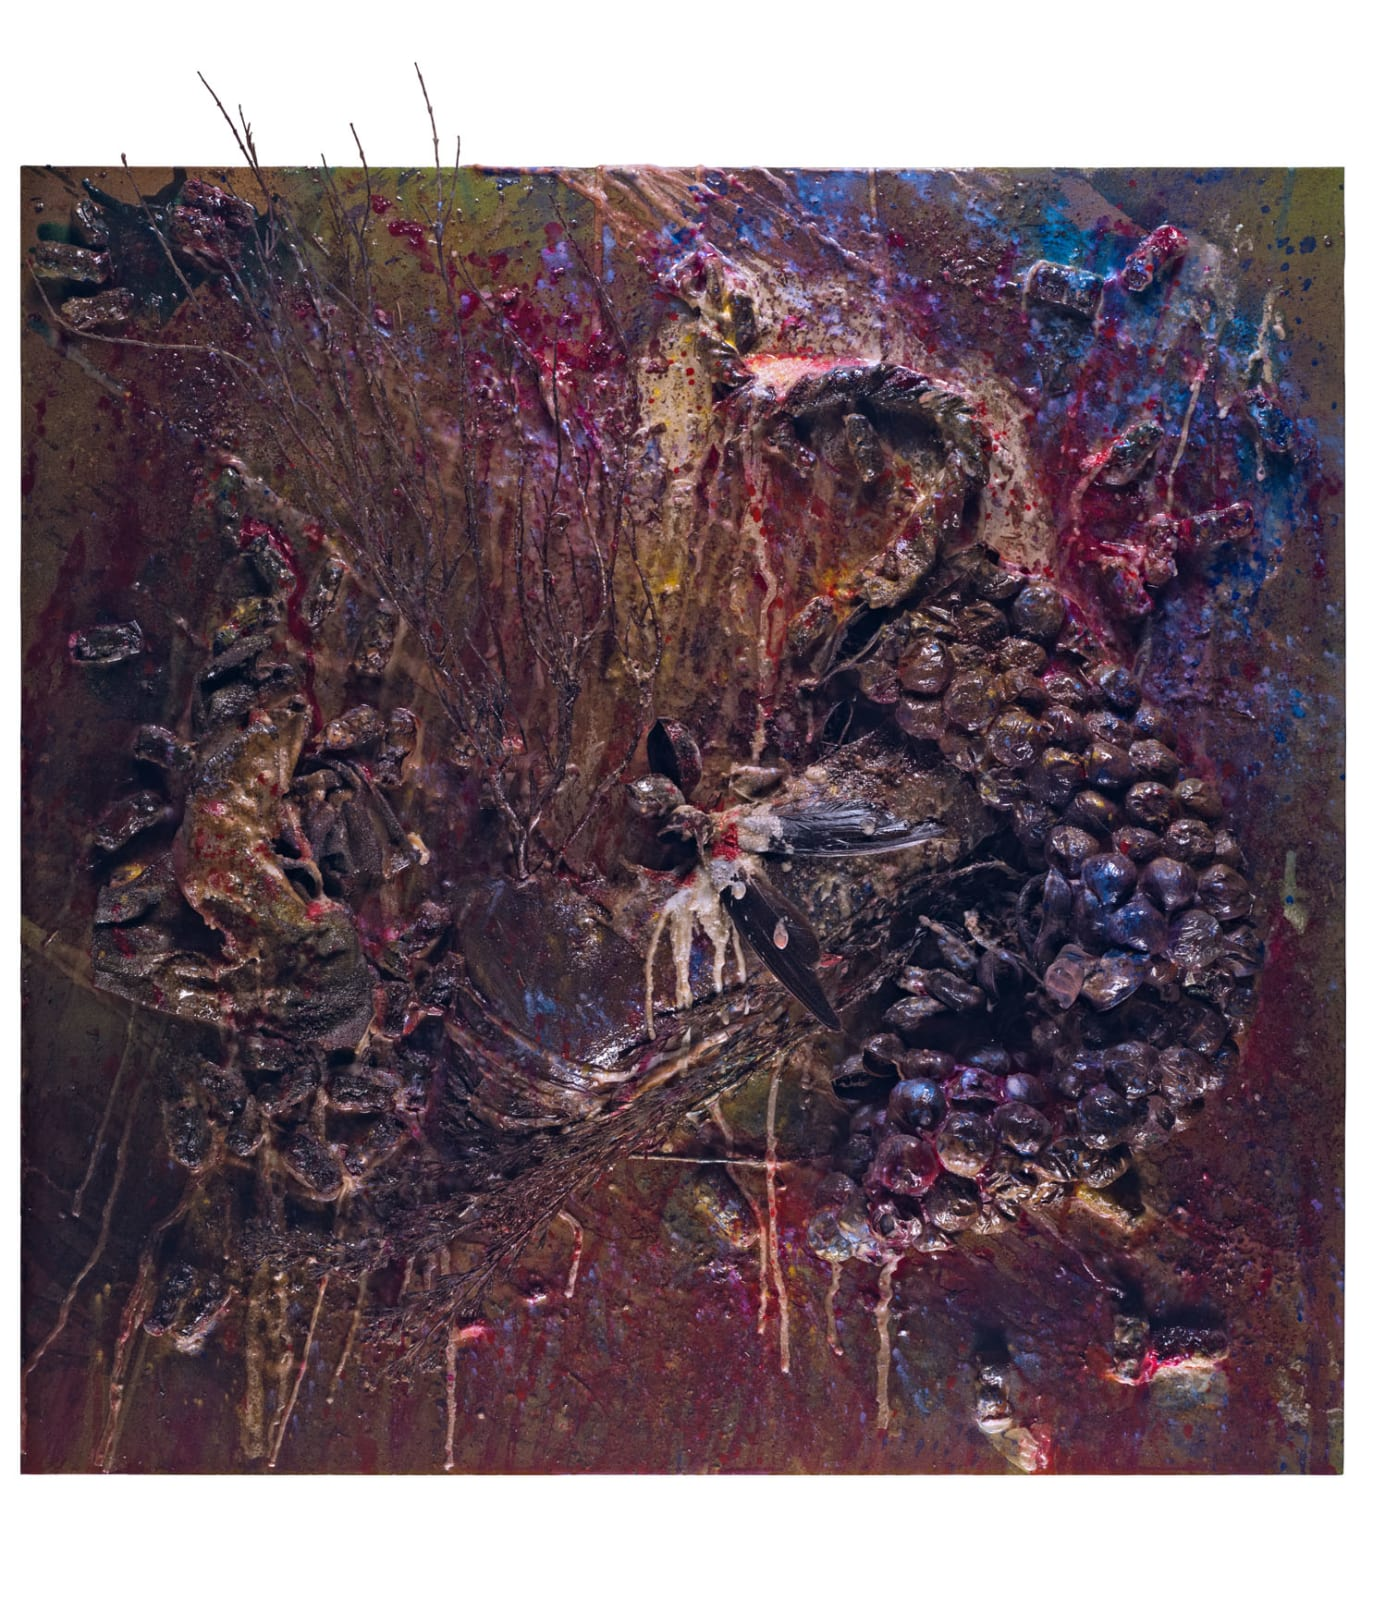 Lyric Joplin, Victory, 2015